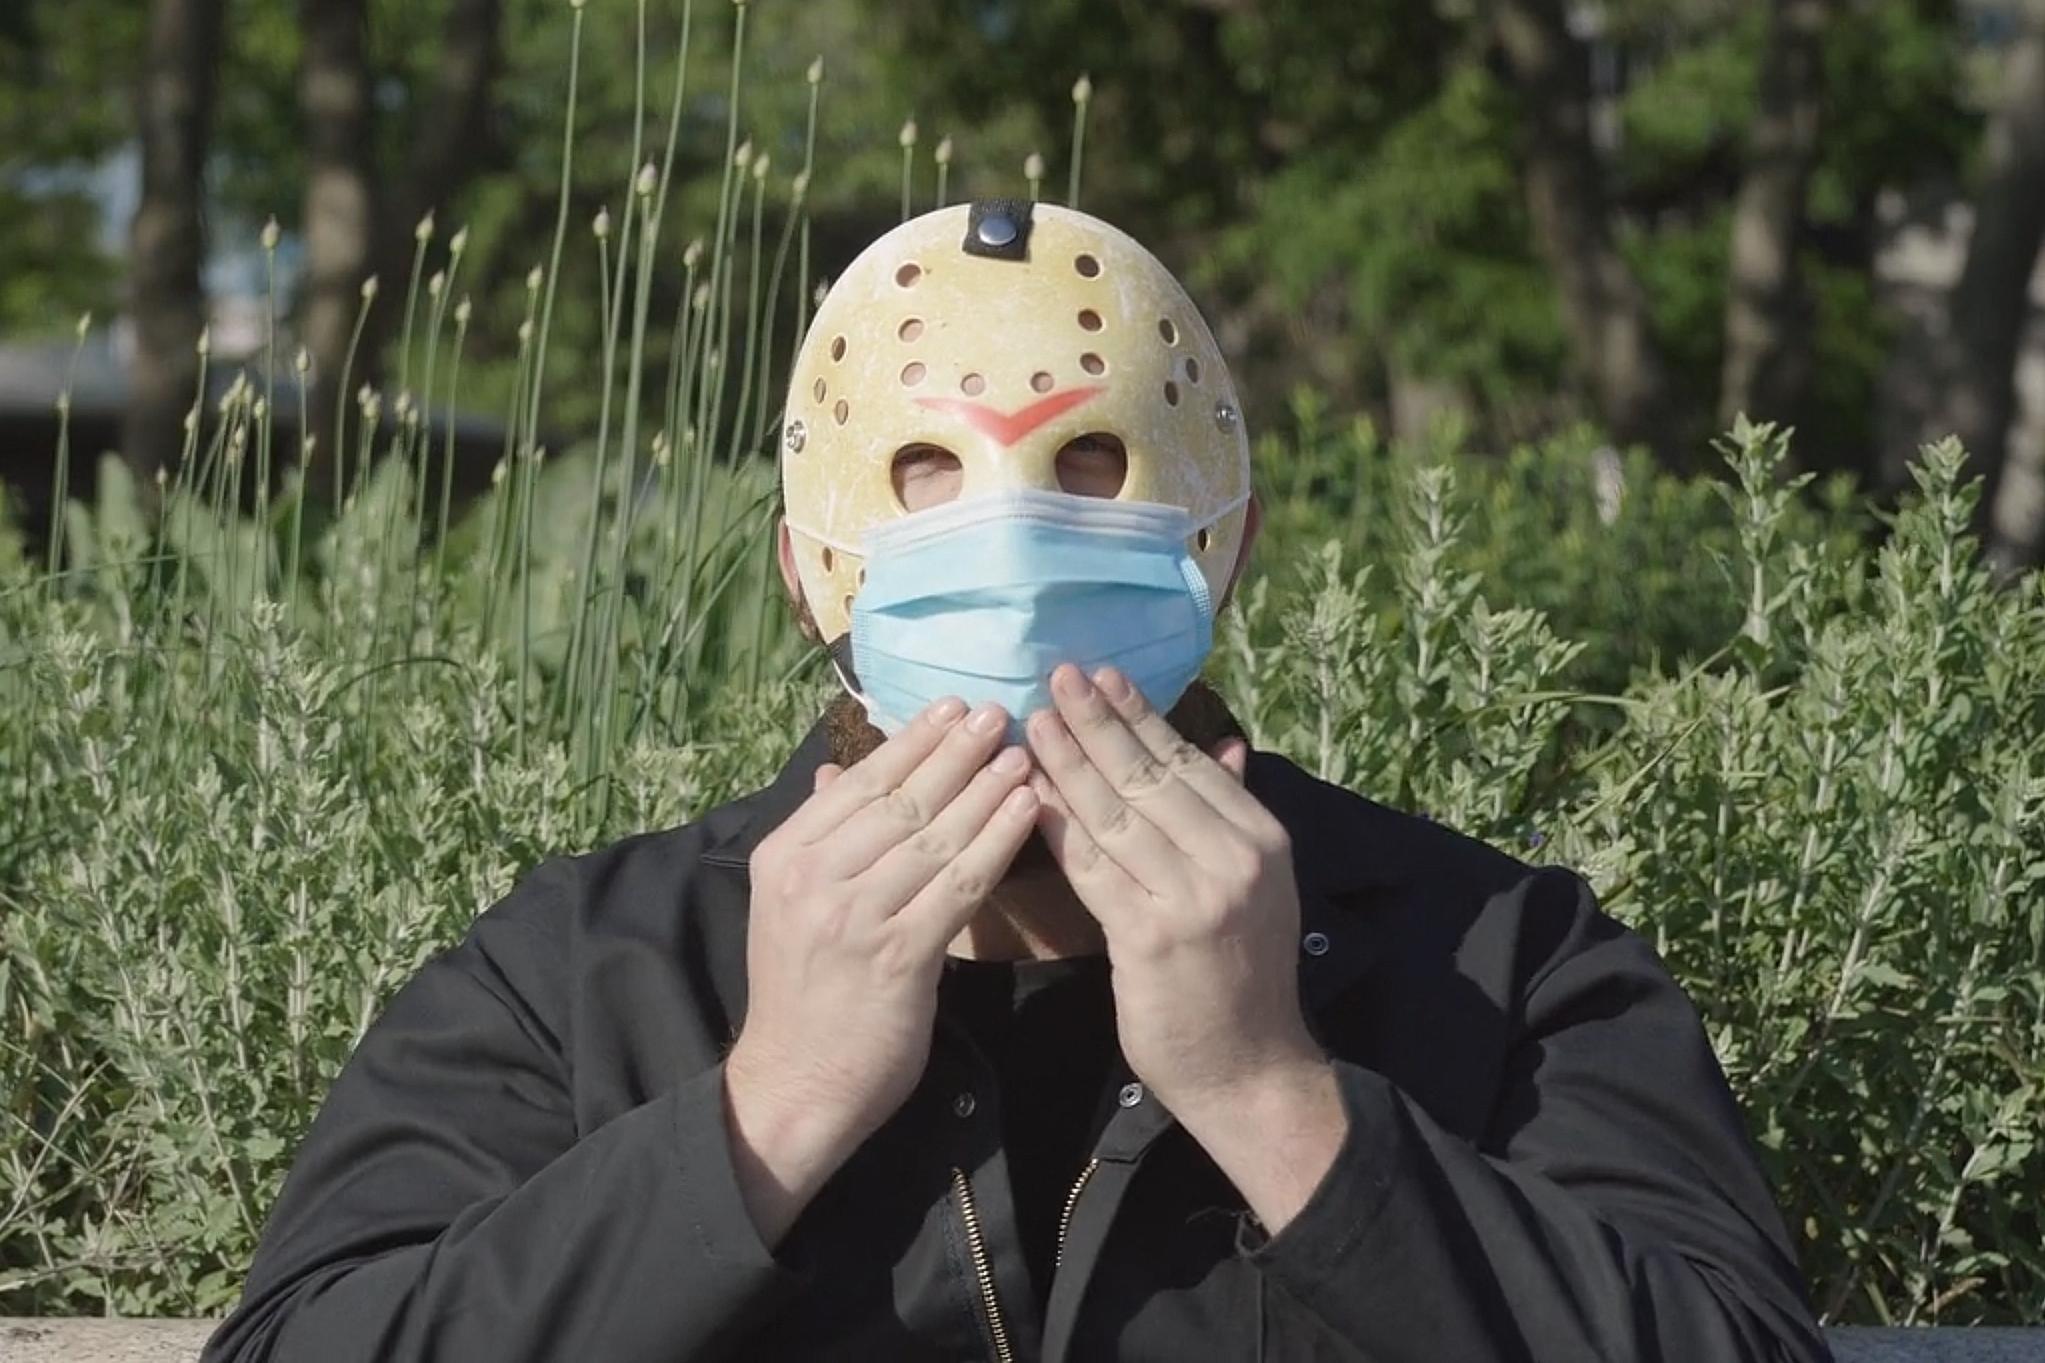 New York: Wear a Mask